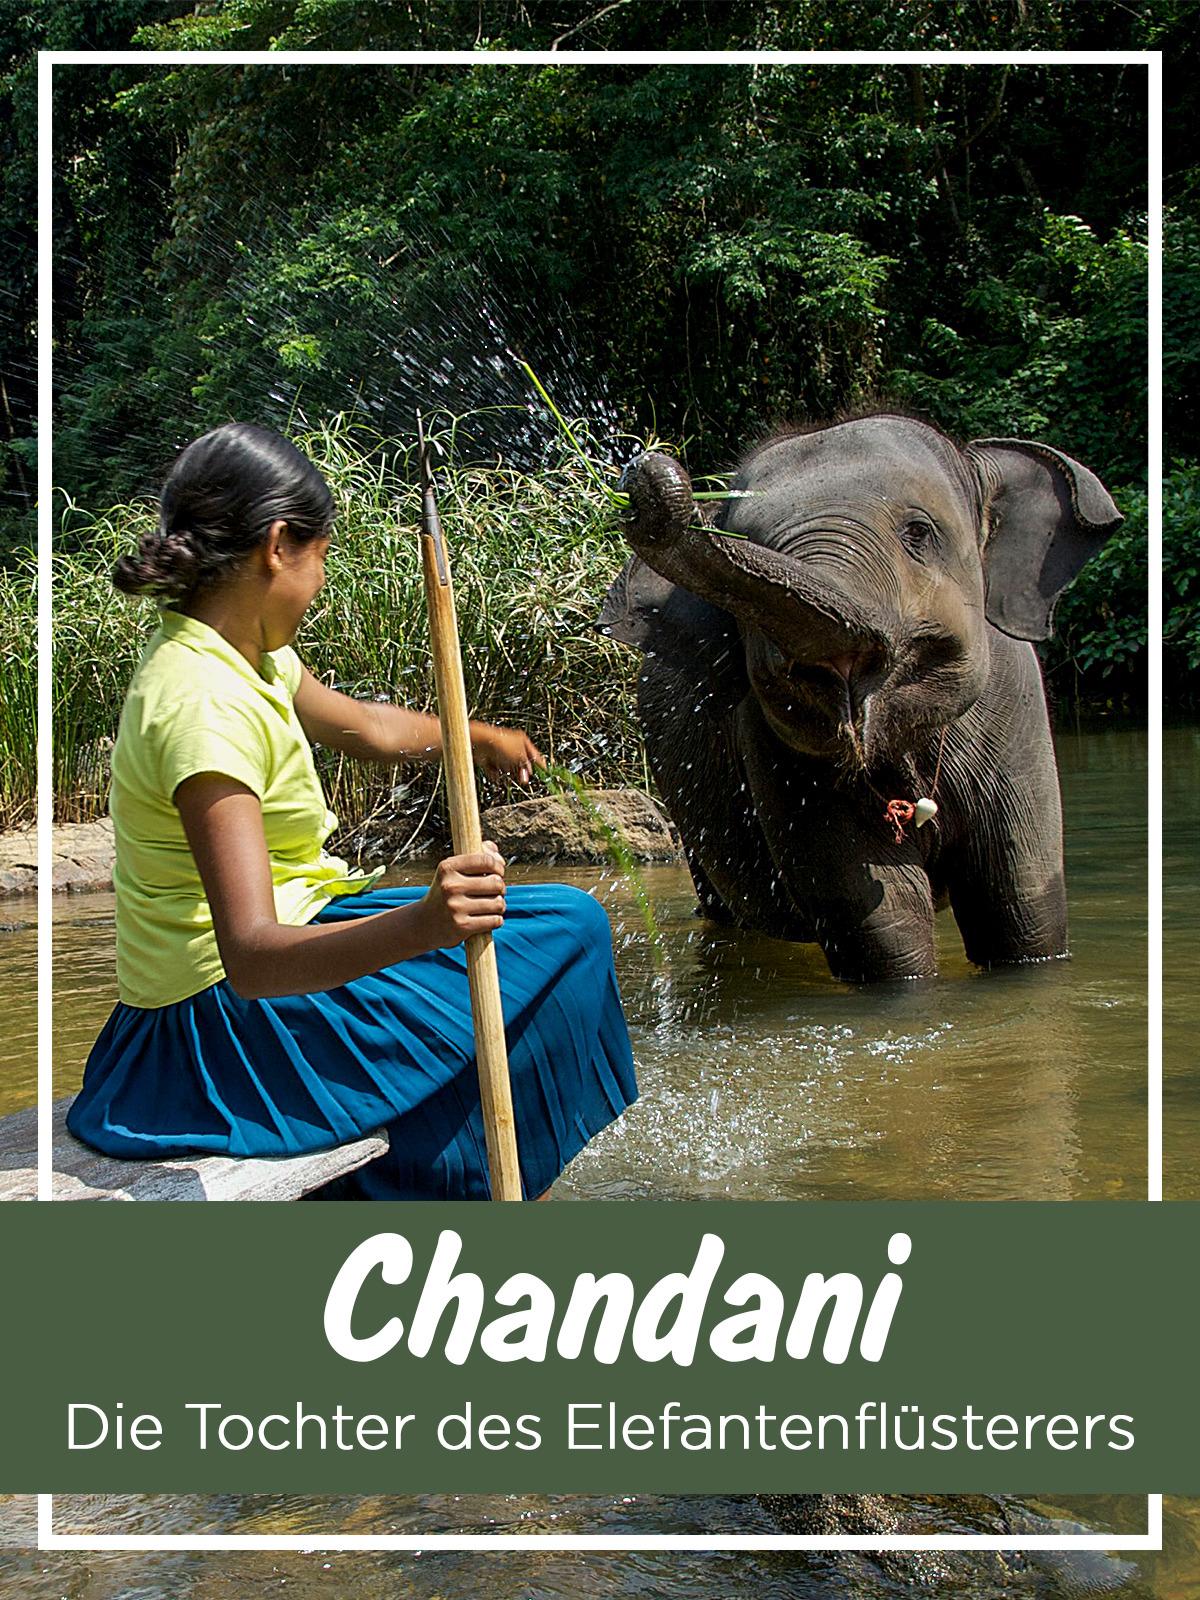 Chandani - Die Tochter des Elefantenflüsterers